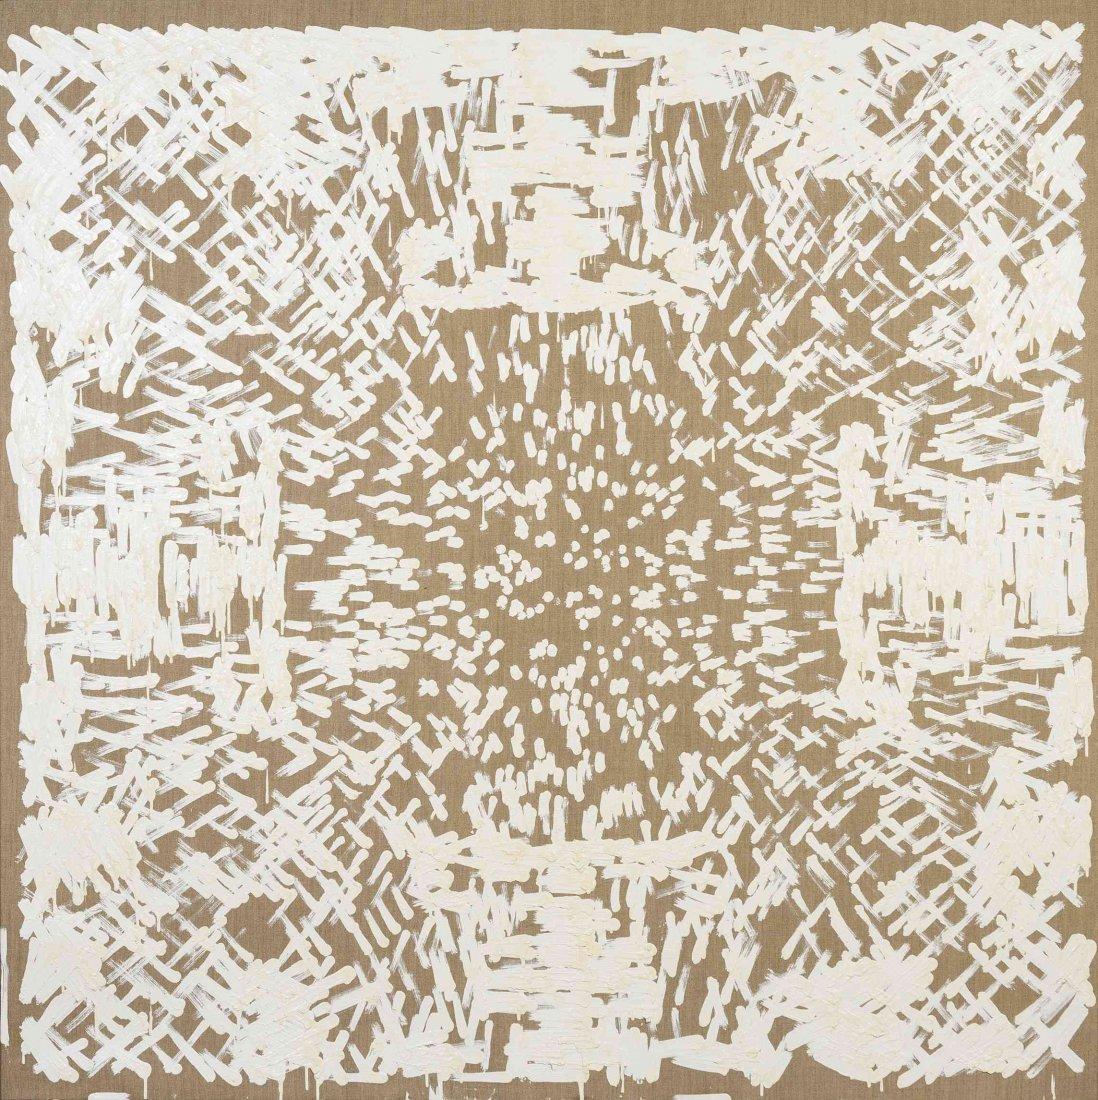 Simon Ingram, (20th/21st century), Painting Assemblage